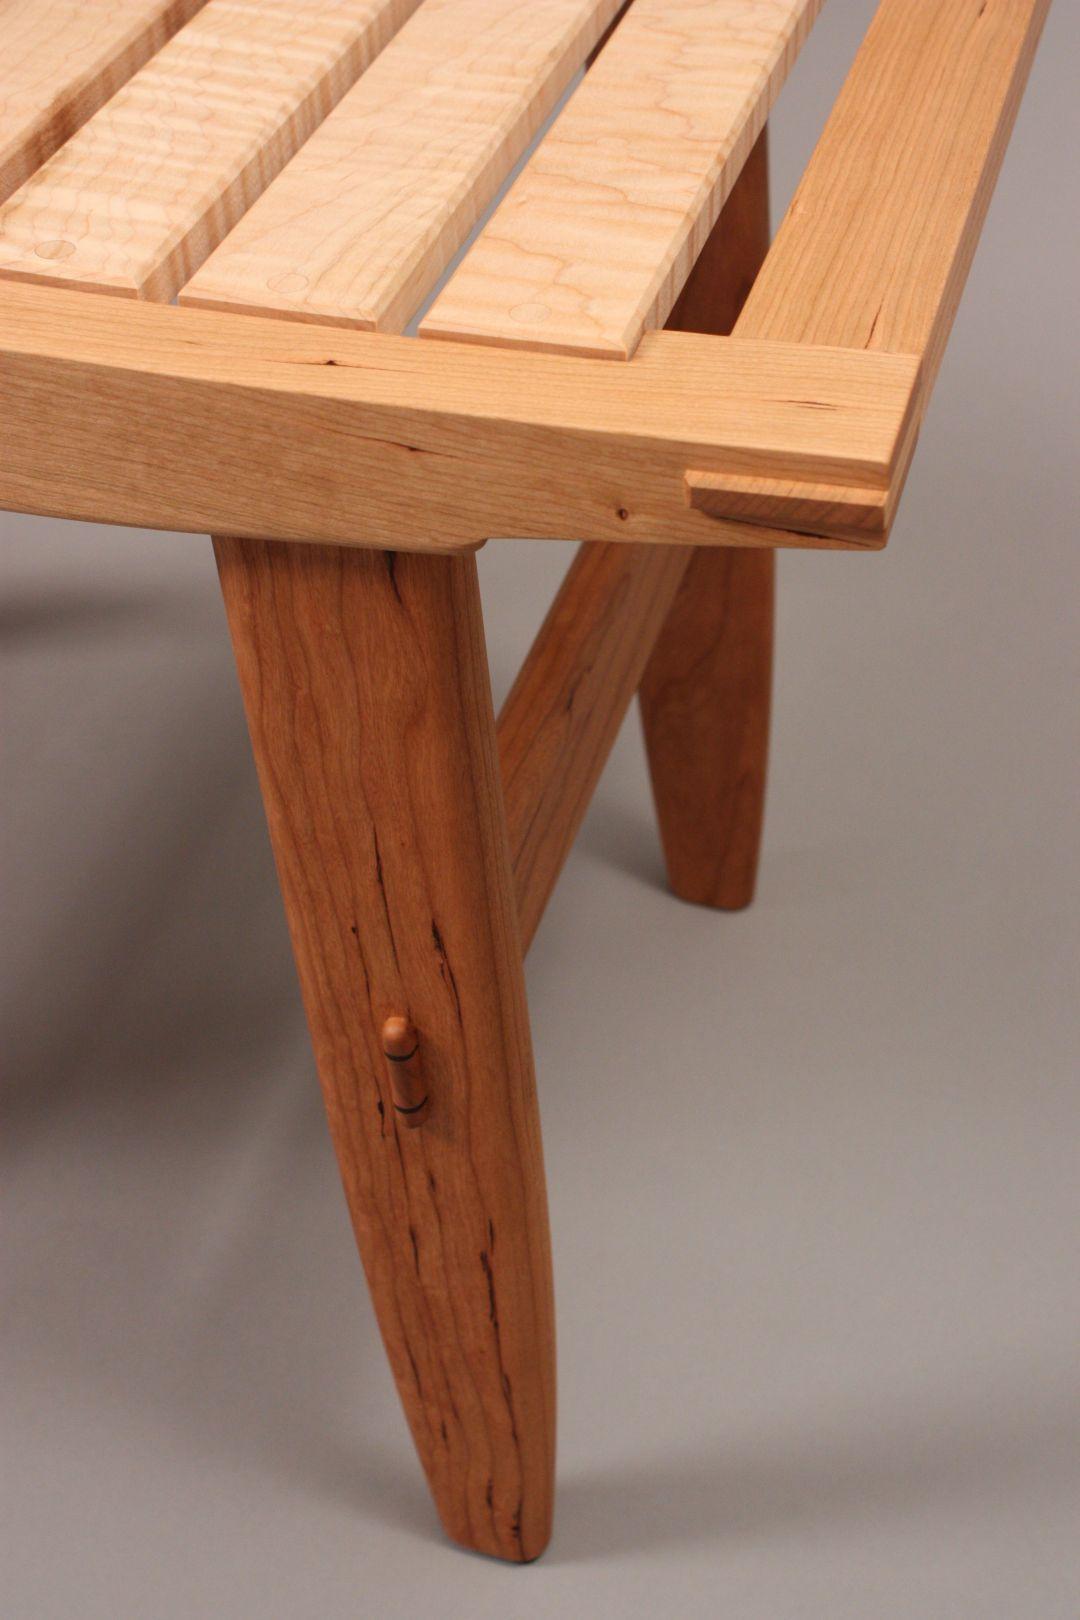 wood bench with slates